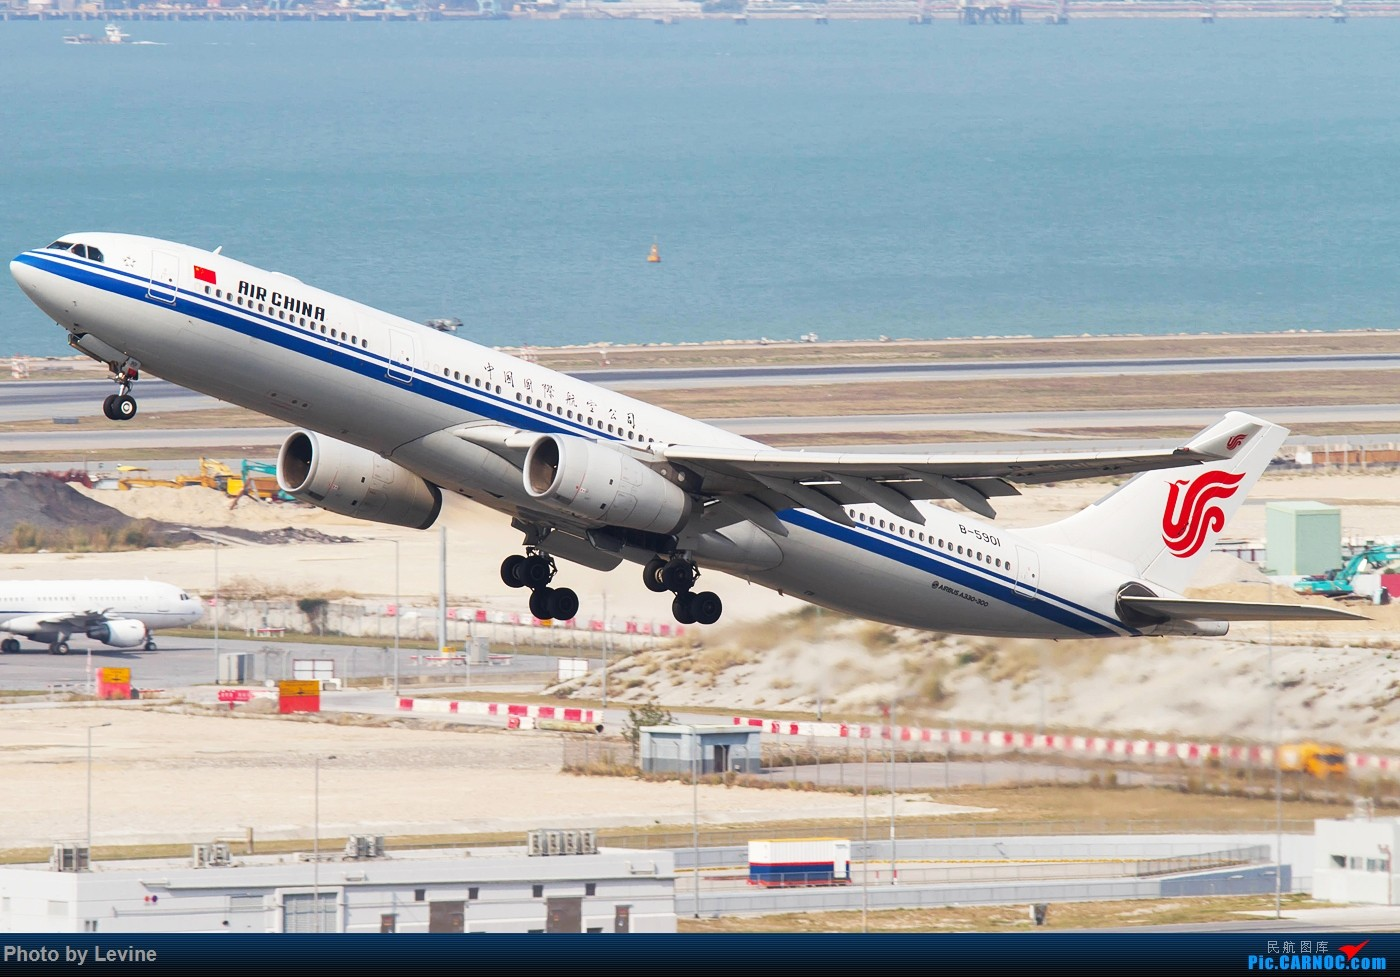 Re:[原创]今冬沙螺湾 迟来的图片 AIRBUS A330-300 B-5901 中国香港国际机场